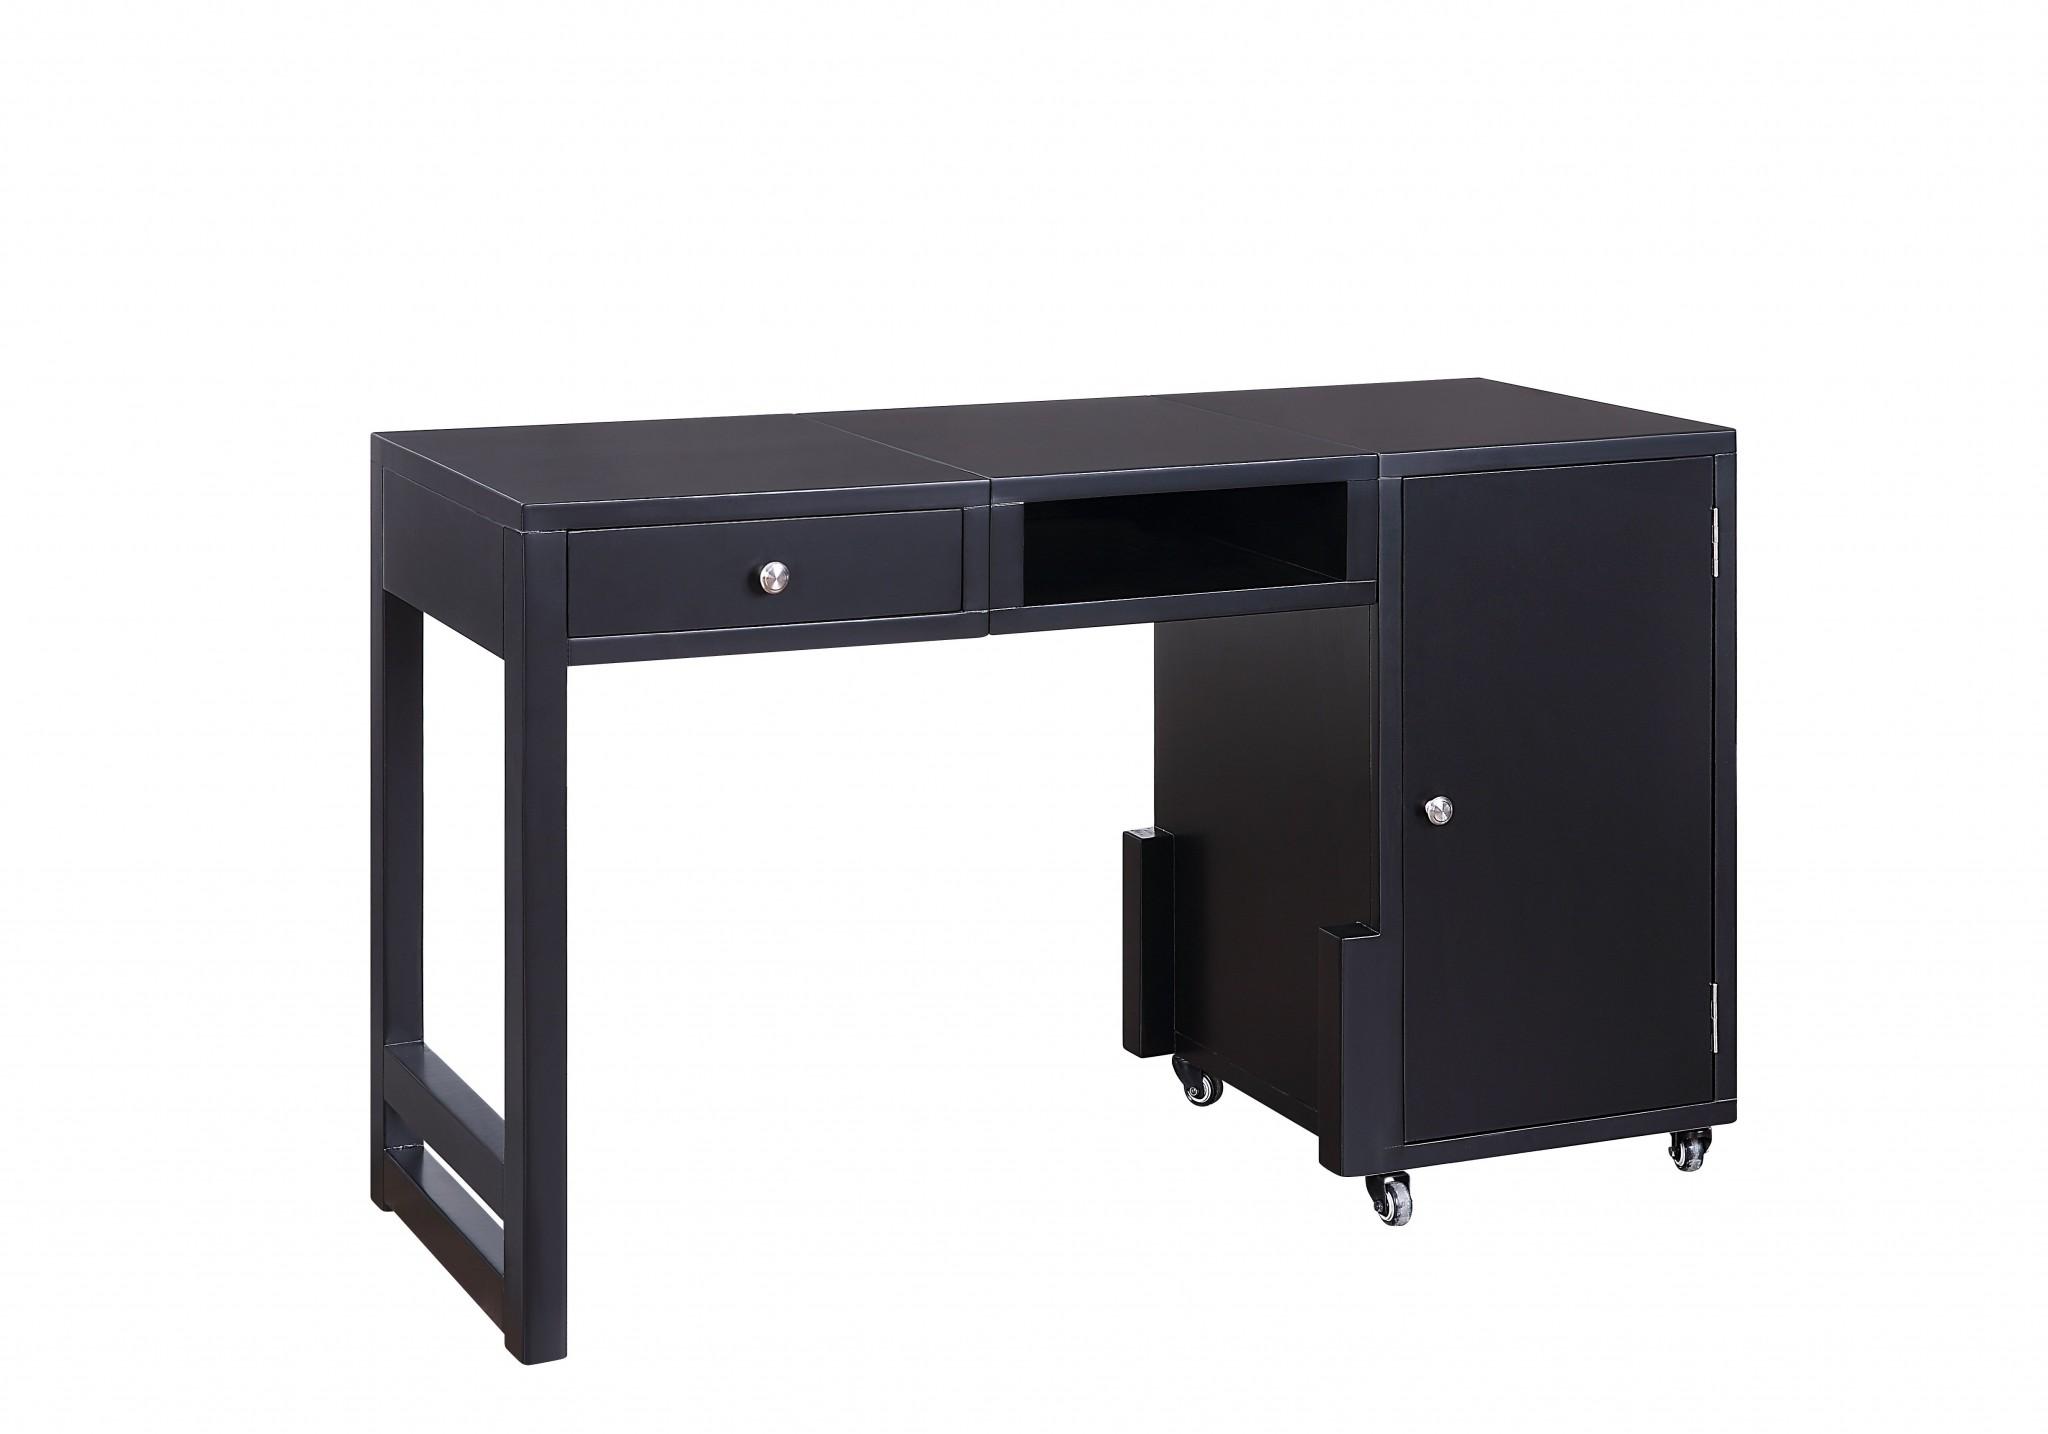 "20"" X 48"" X 30"" Black Wood Veneer Desk (Convertible)"